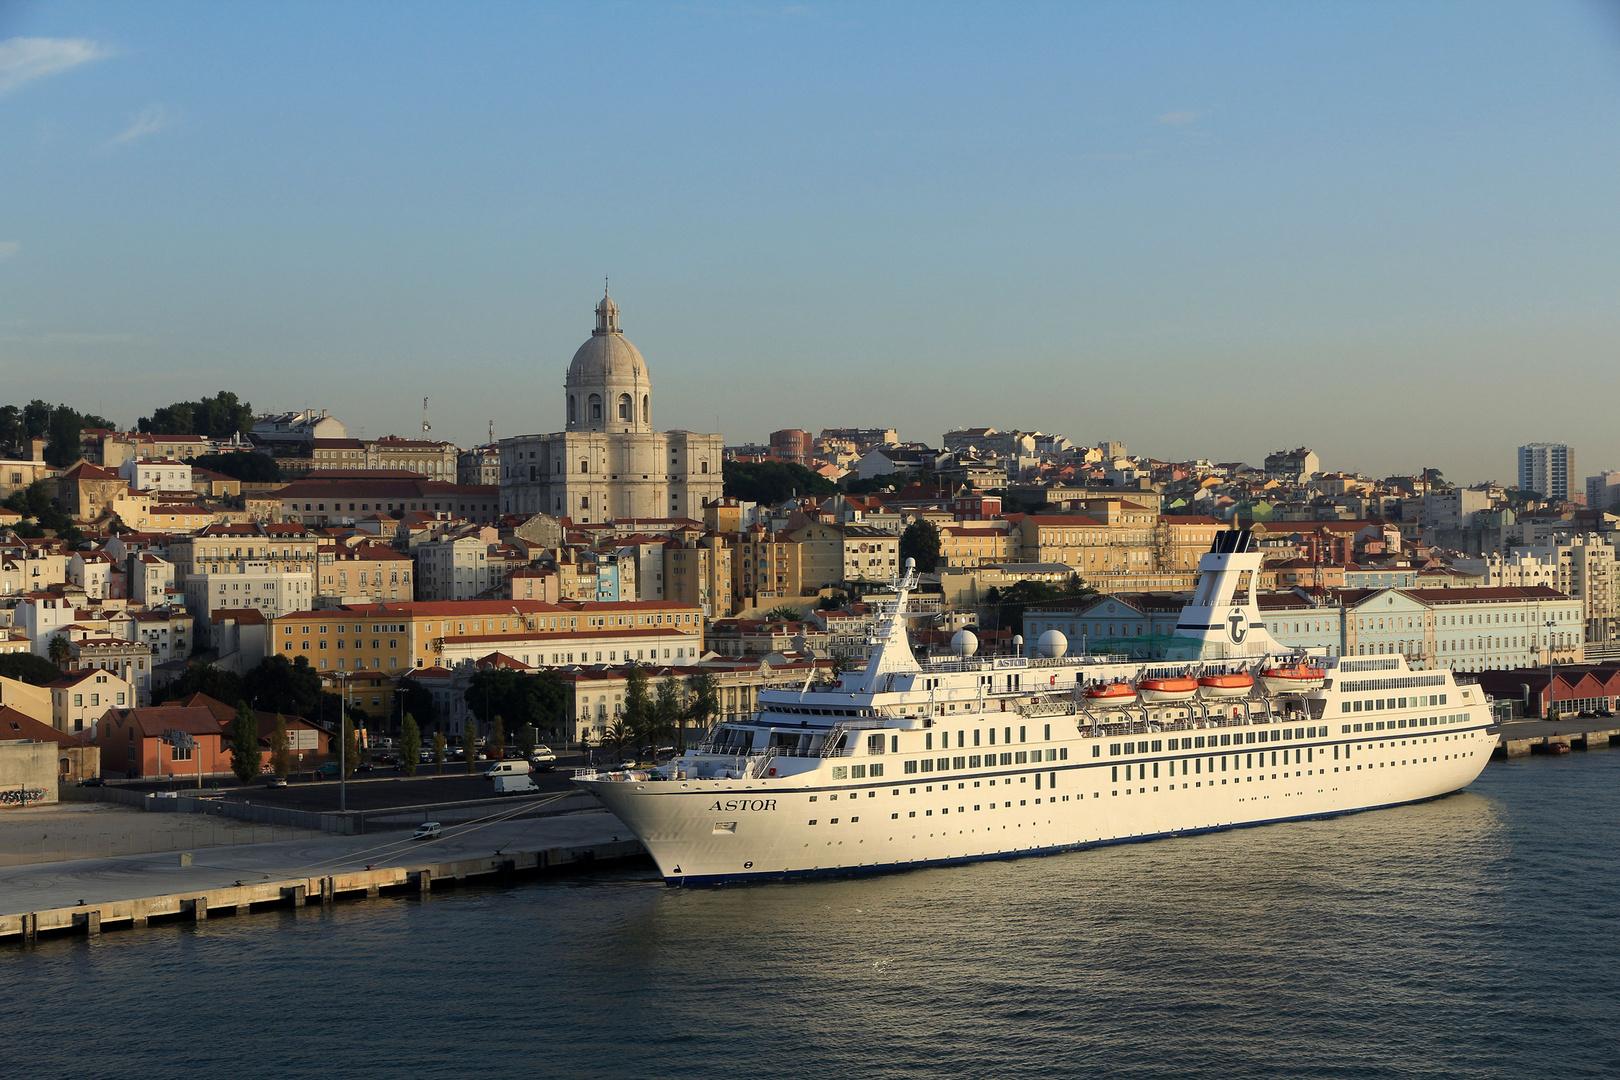 MS Astor ankert in Lisabon